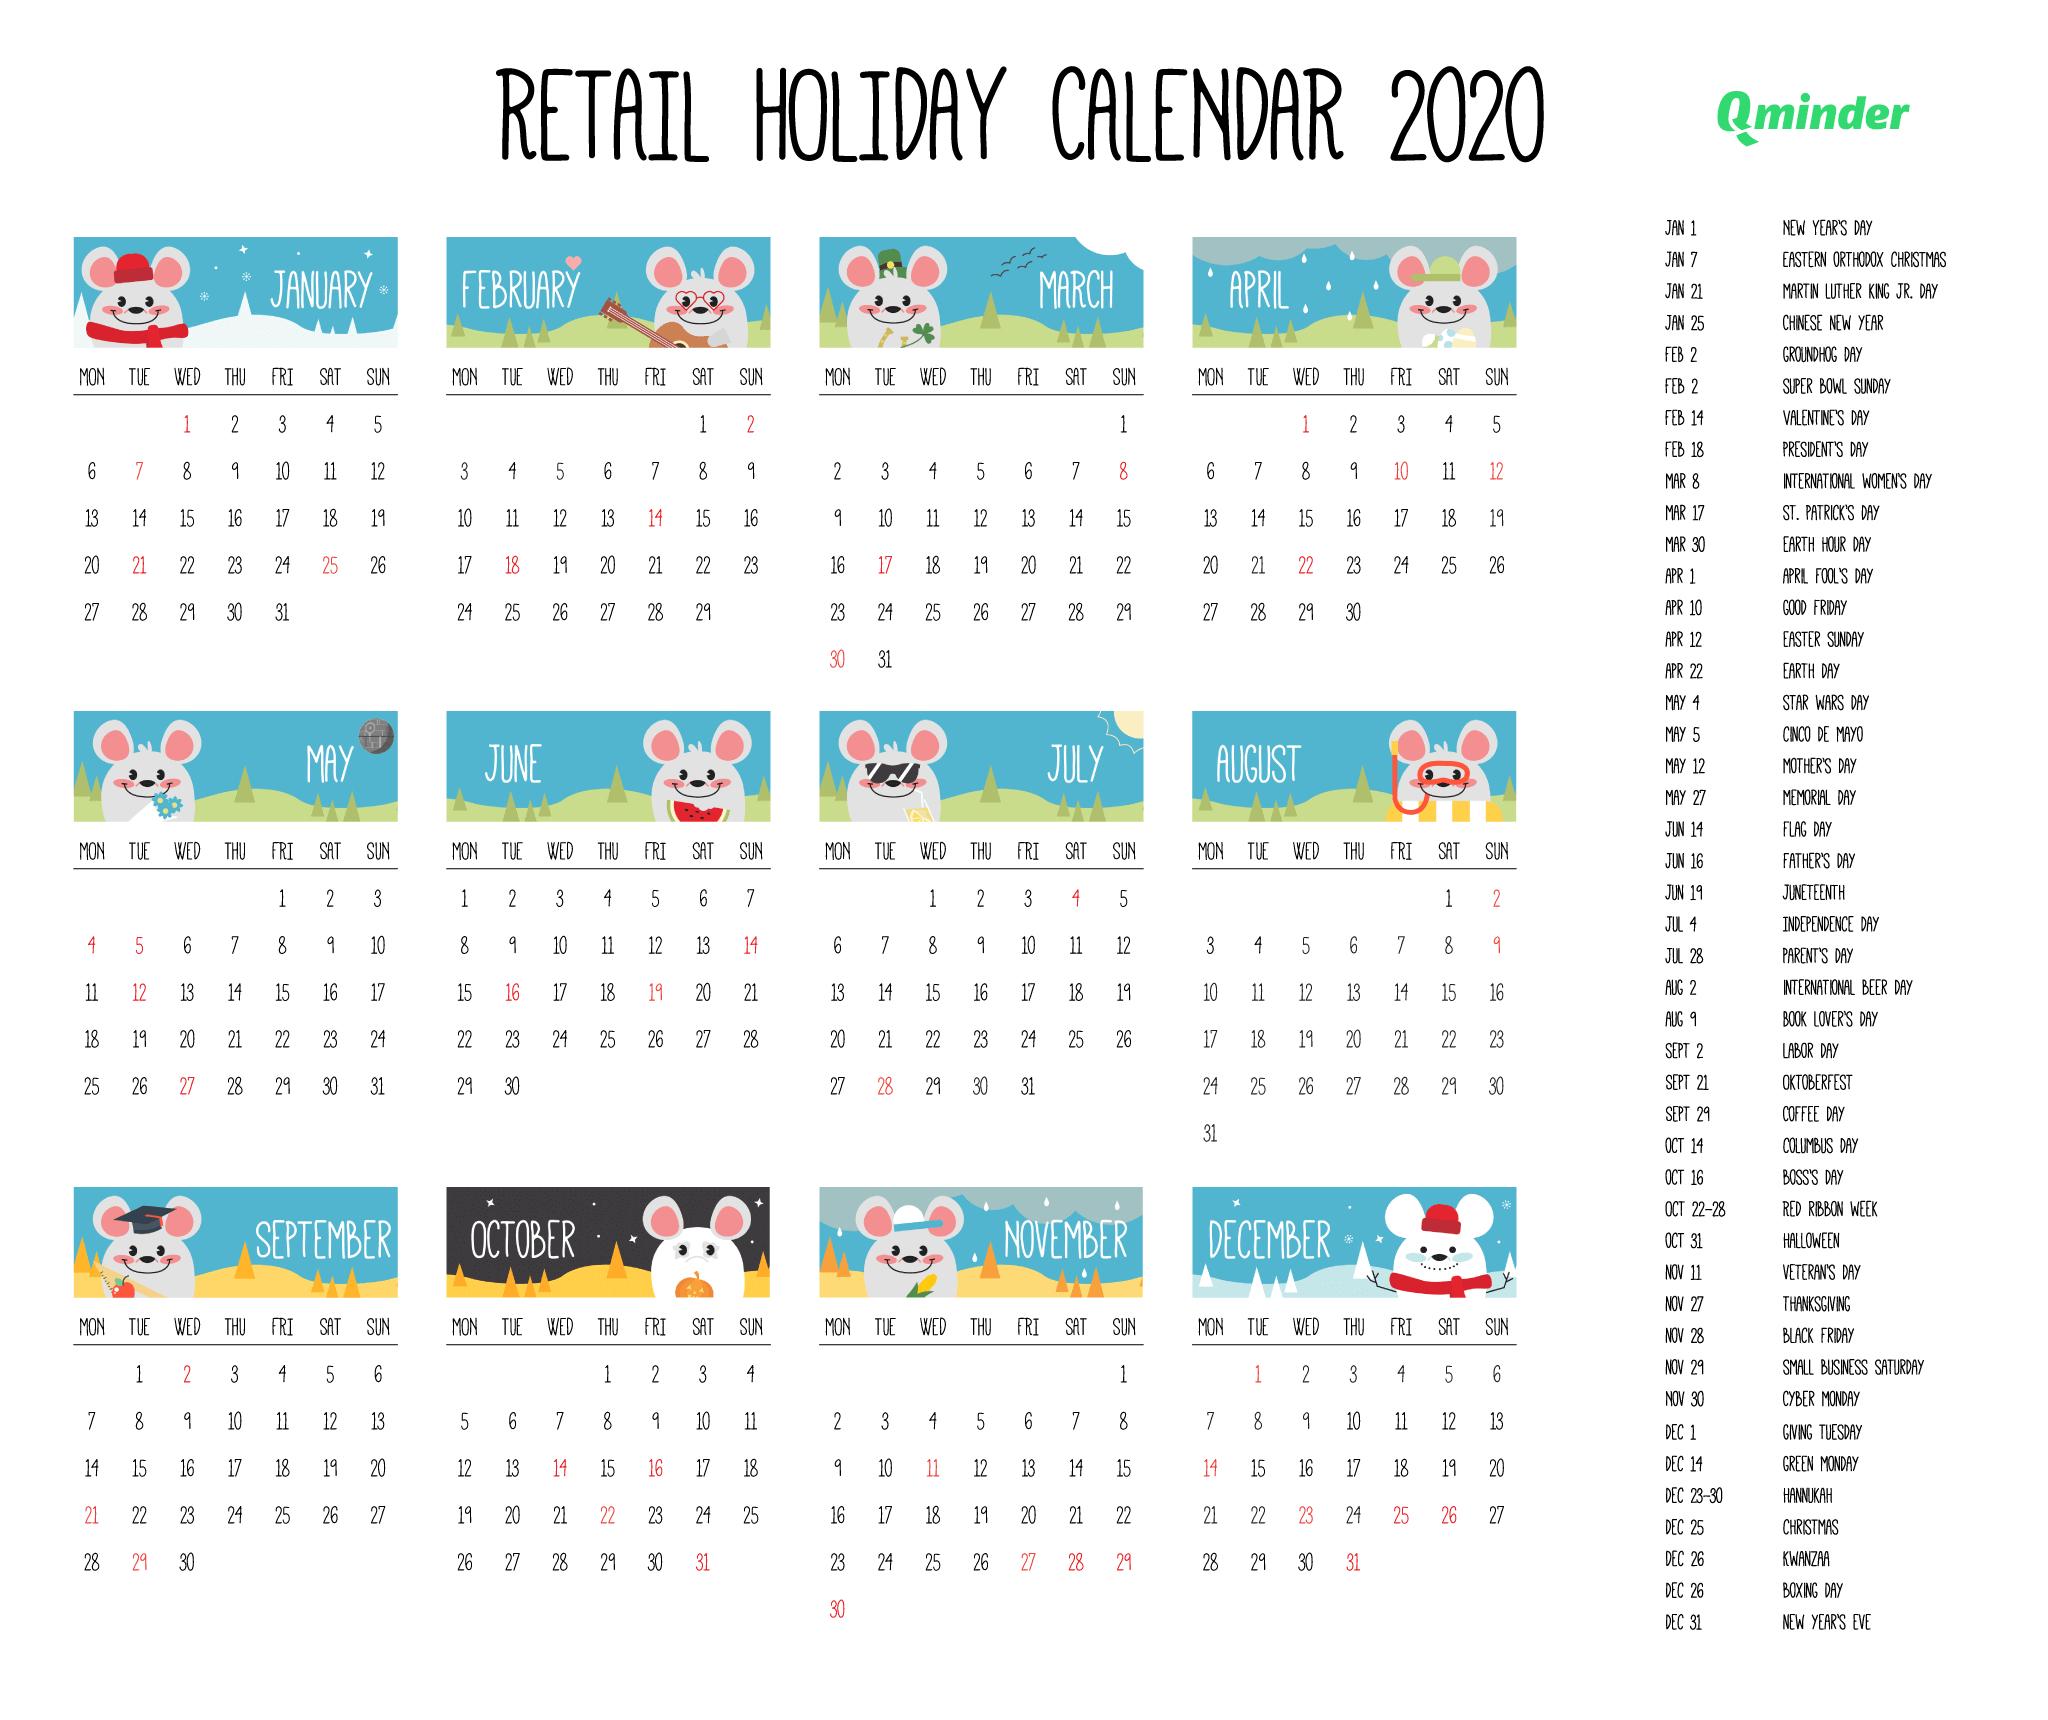 Holiday Today / Free Malaysia Holidays Calendar 2020 with regard to Retail Calendar 2022 4-5-4 Explained